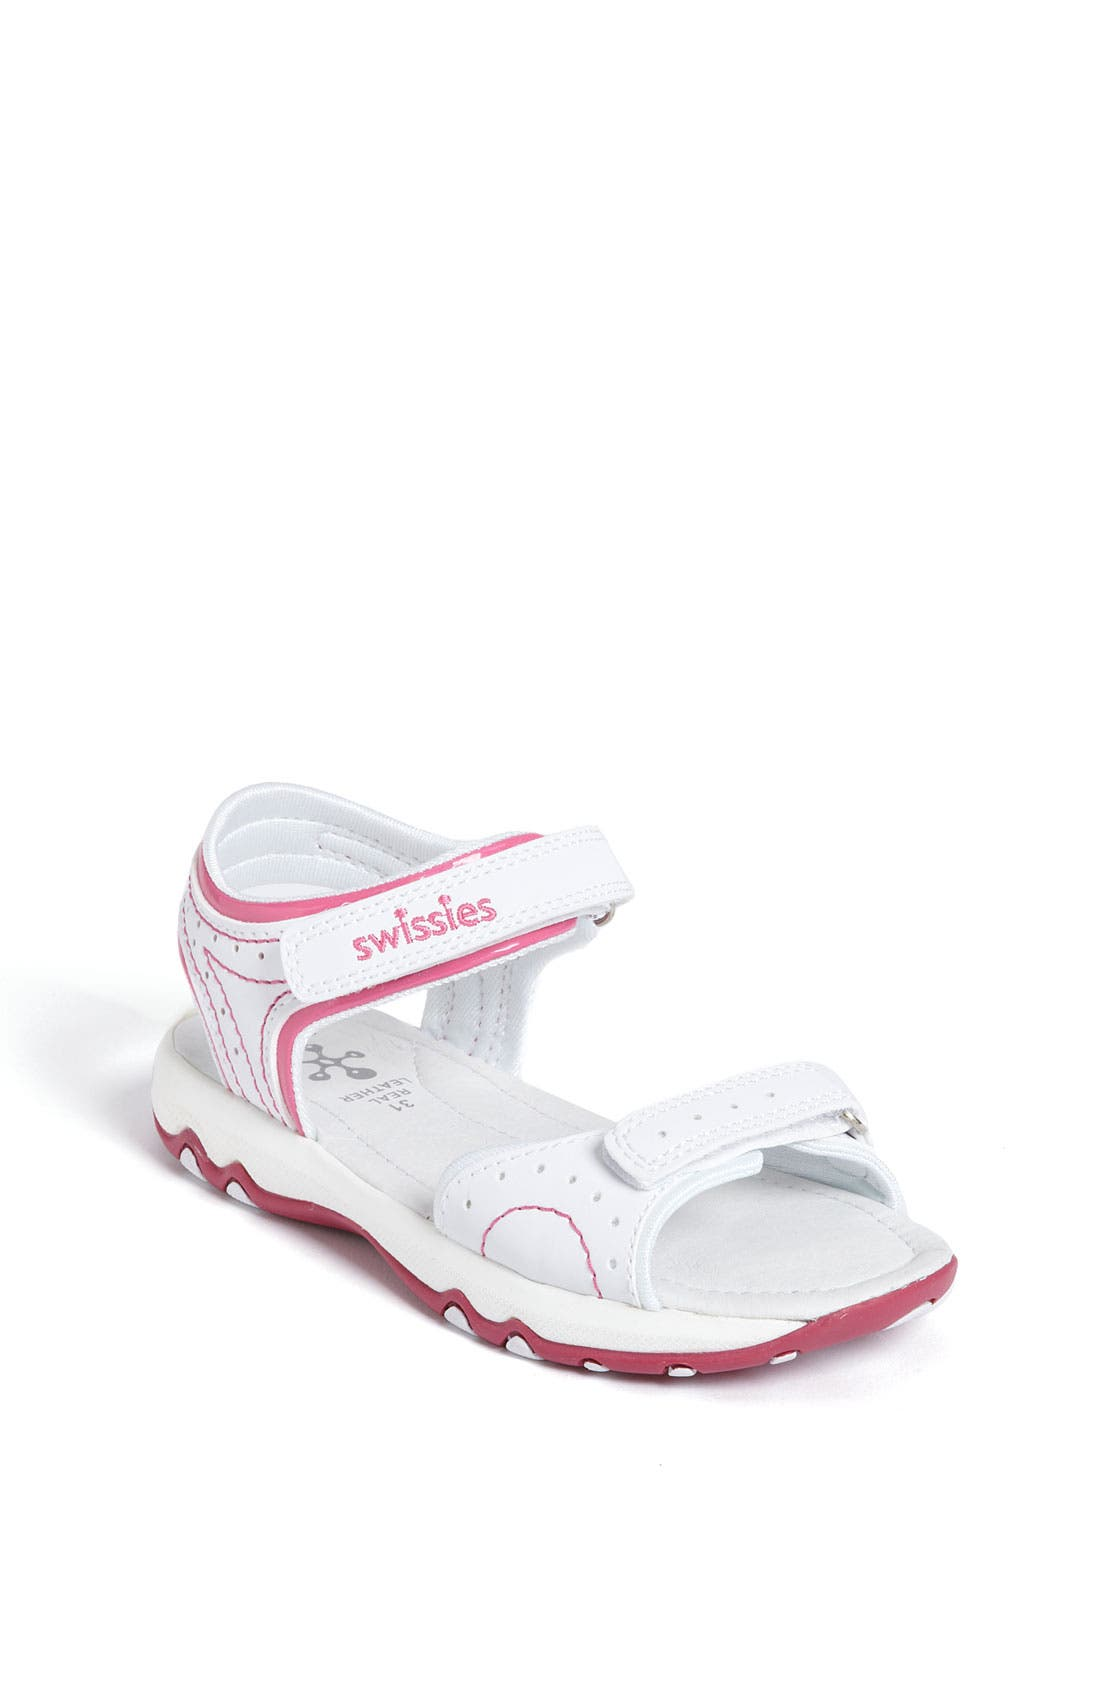 Main Image - Swissies 'Maya' Sandal (Toddler, Little Kid & Big Kid)